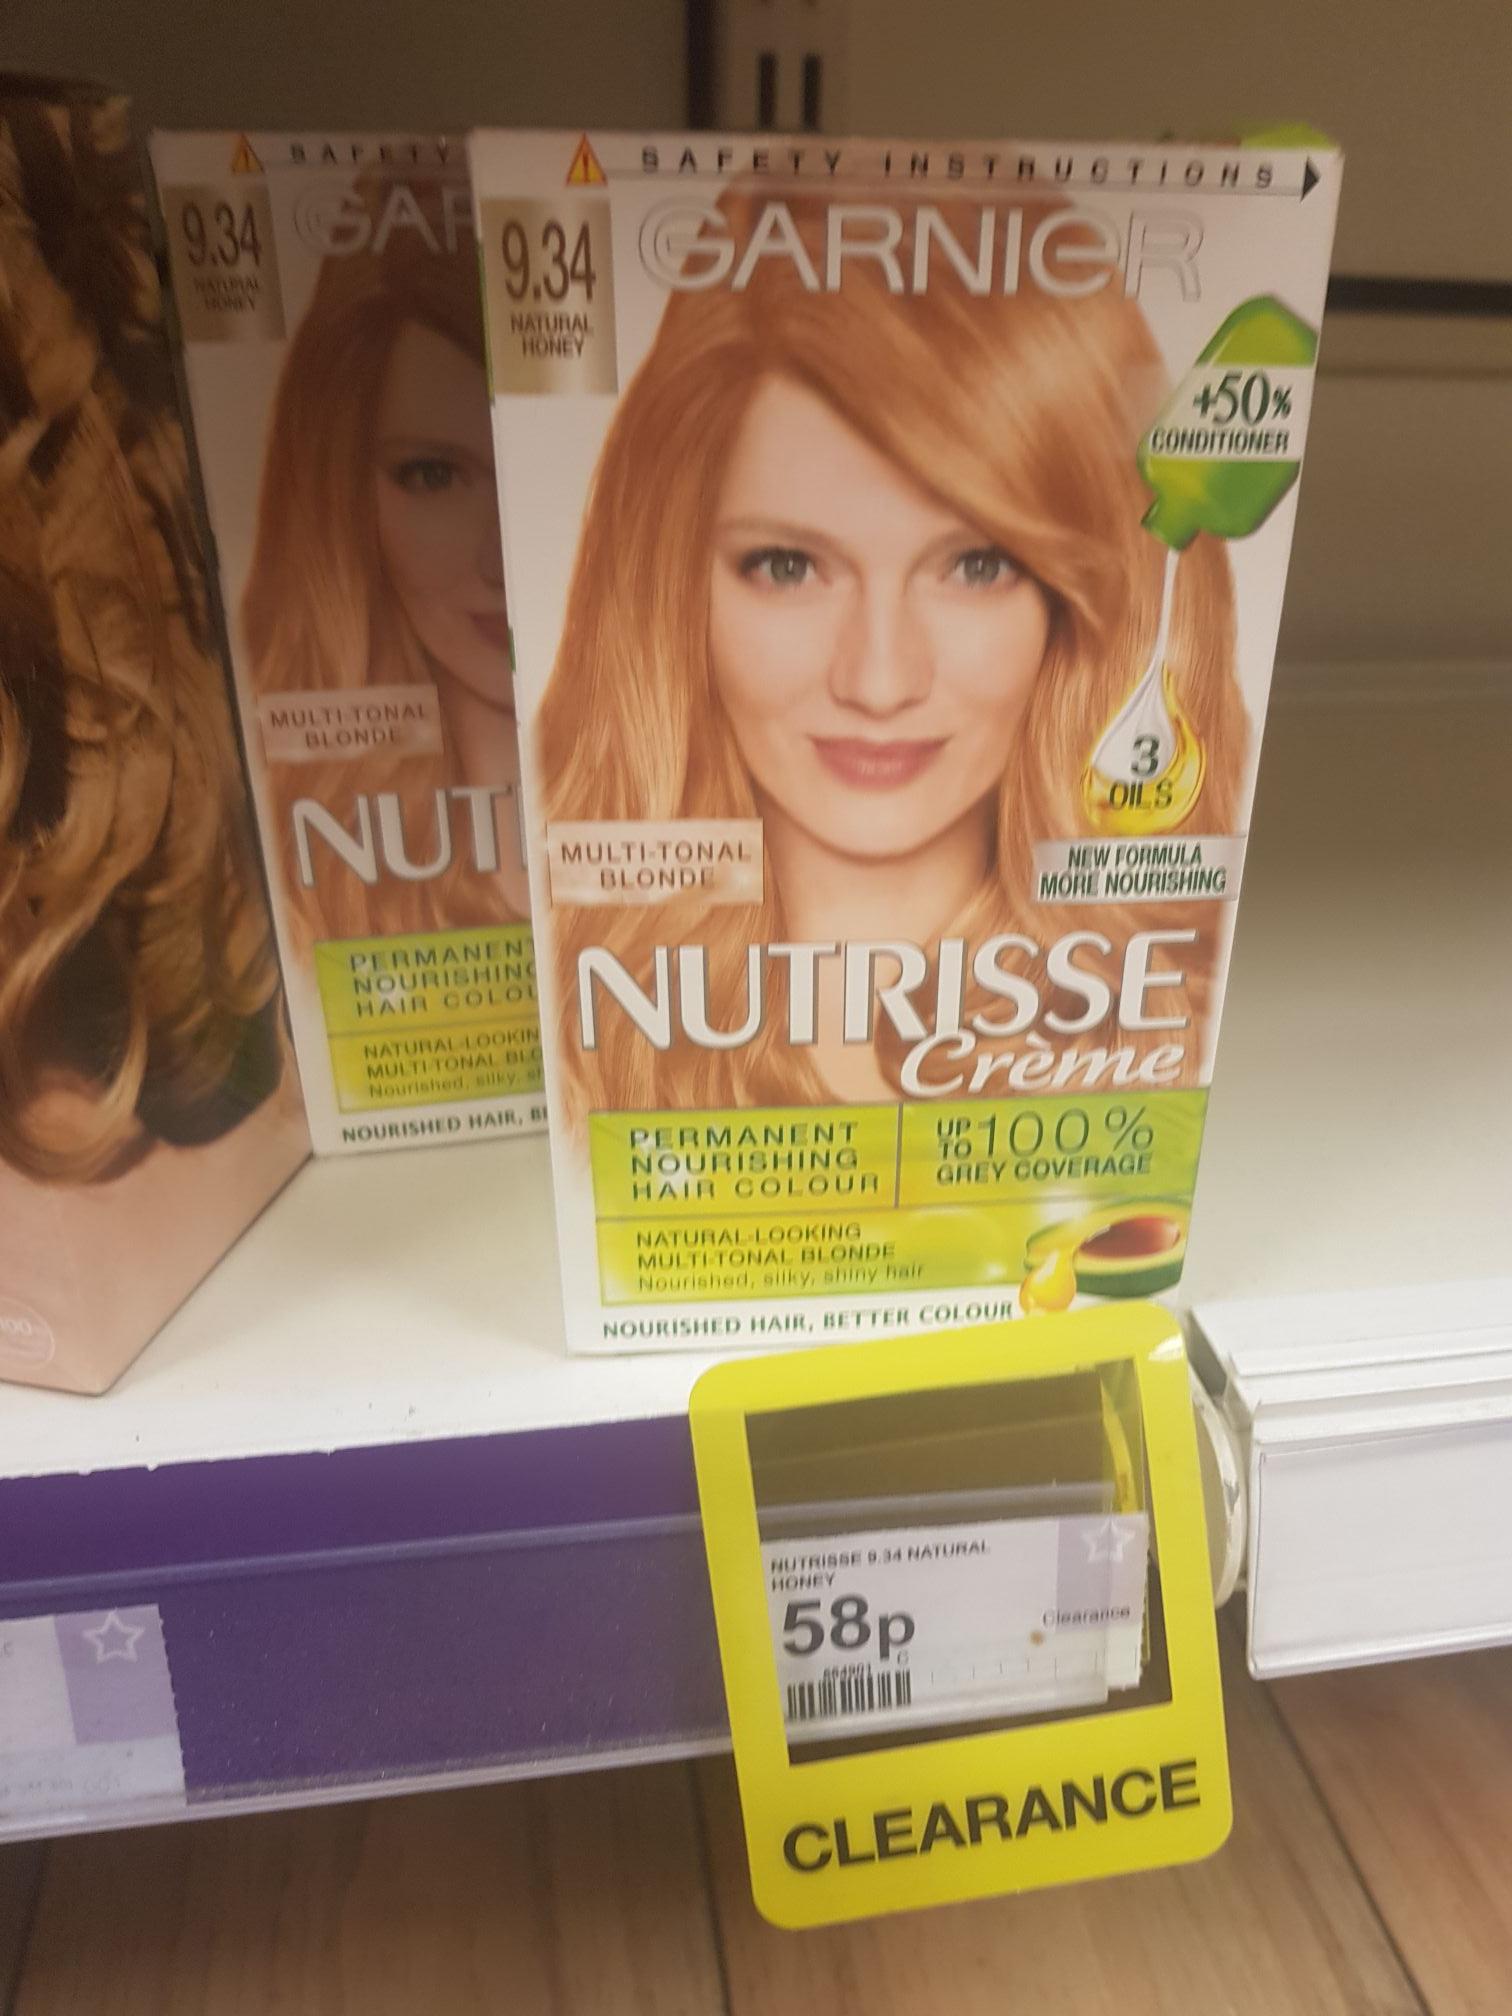 Garnier Nutrisse Creme permanent hair dye (Honey) 58p instore at superdrug